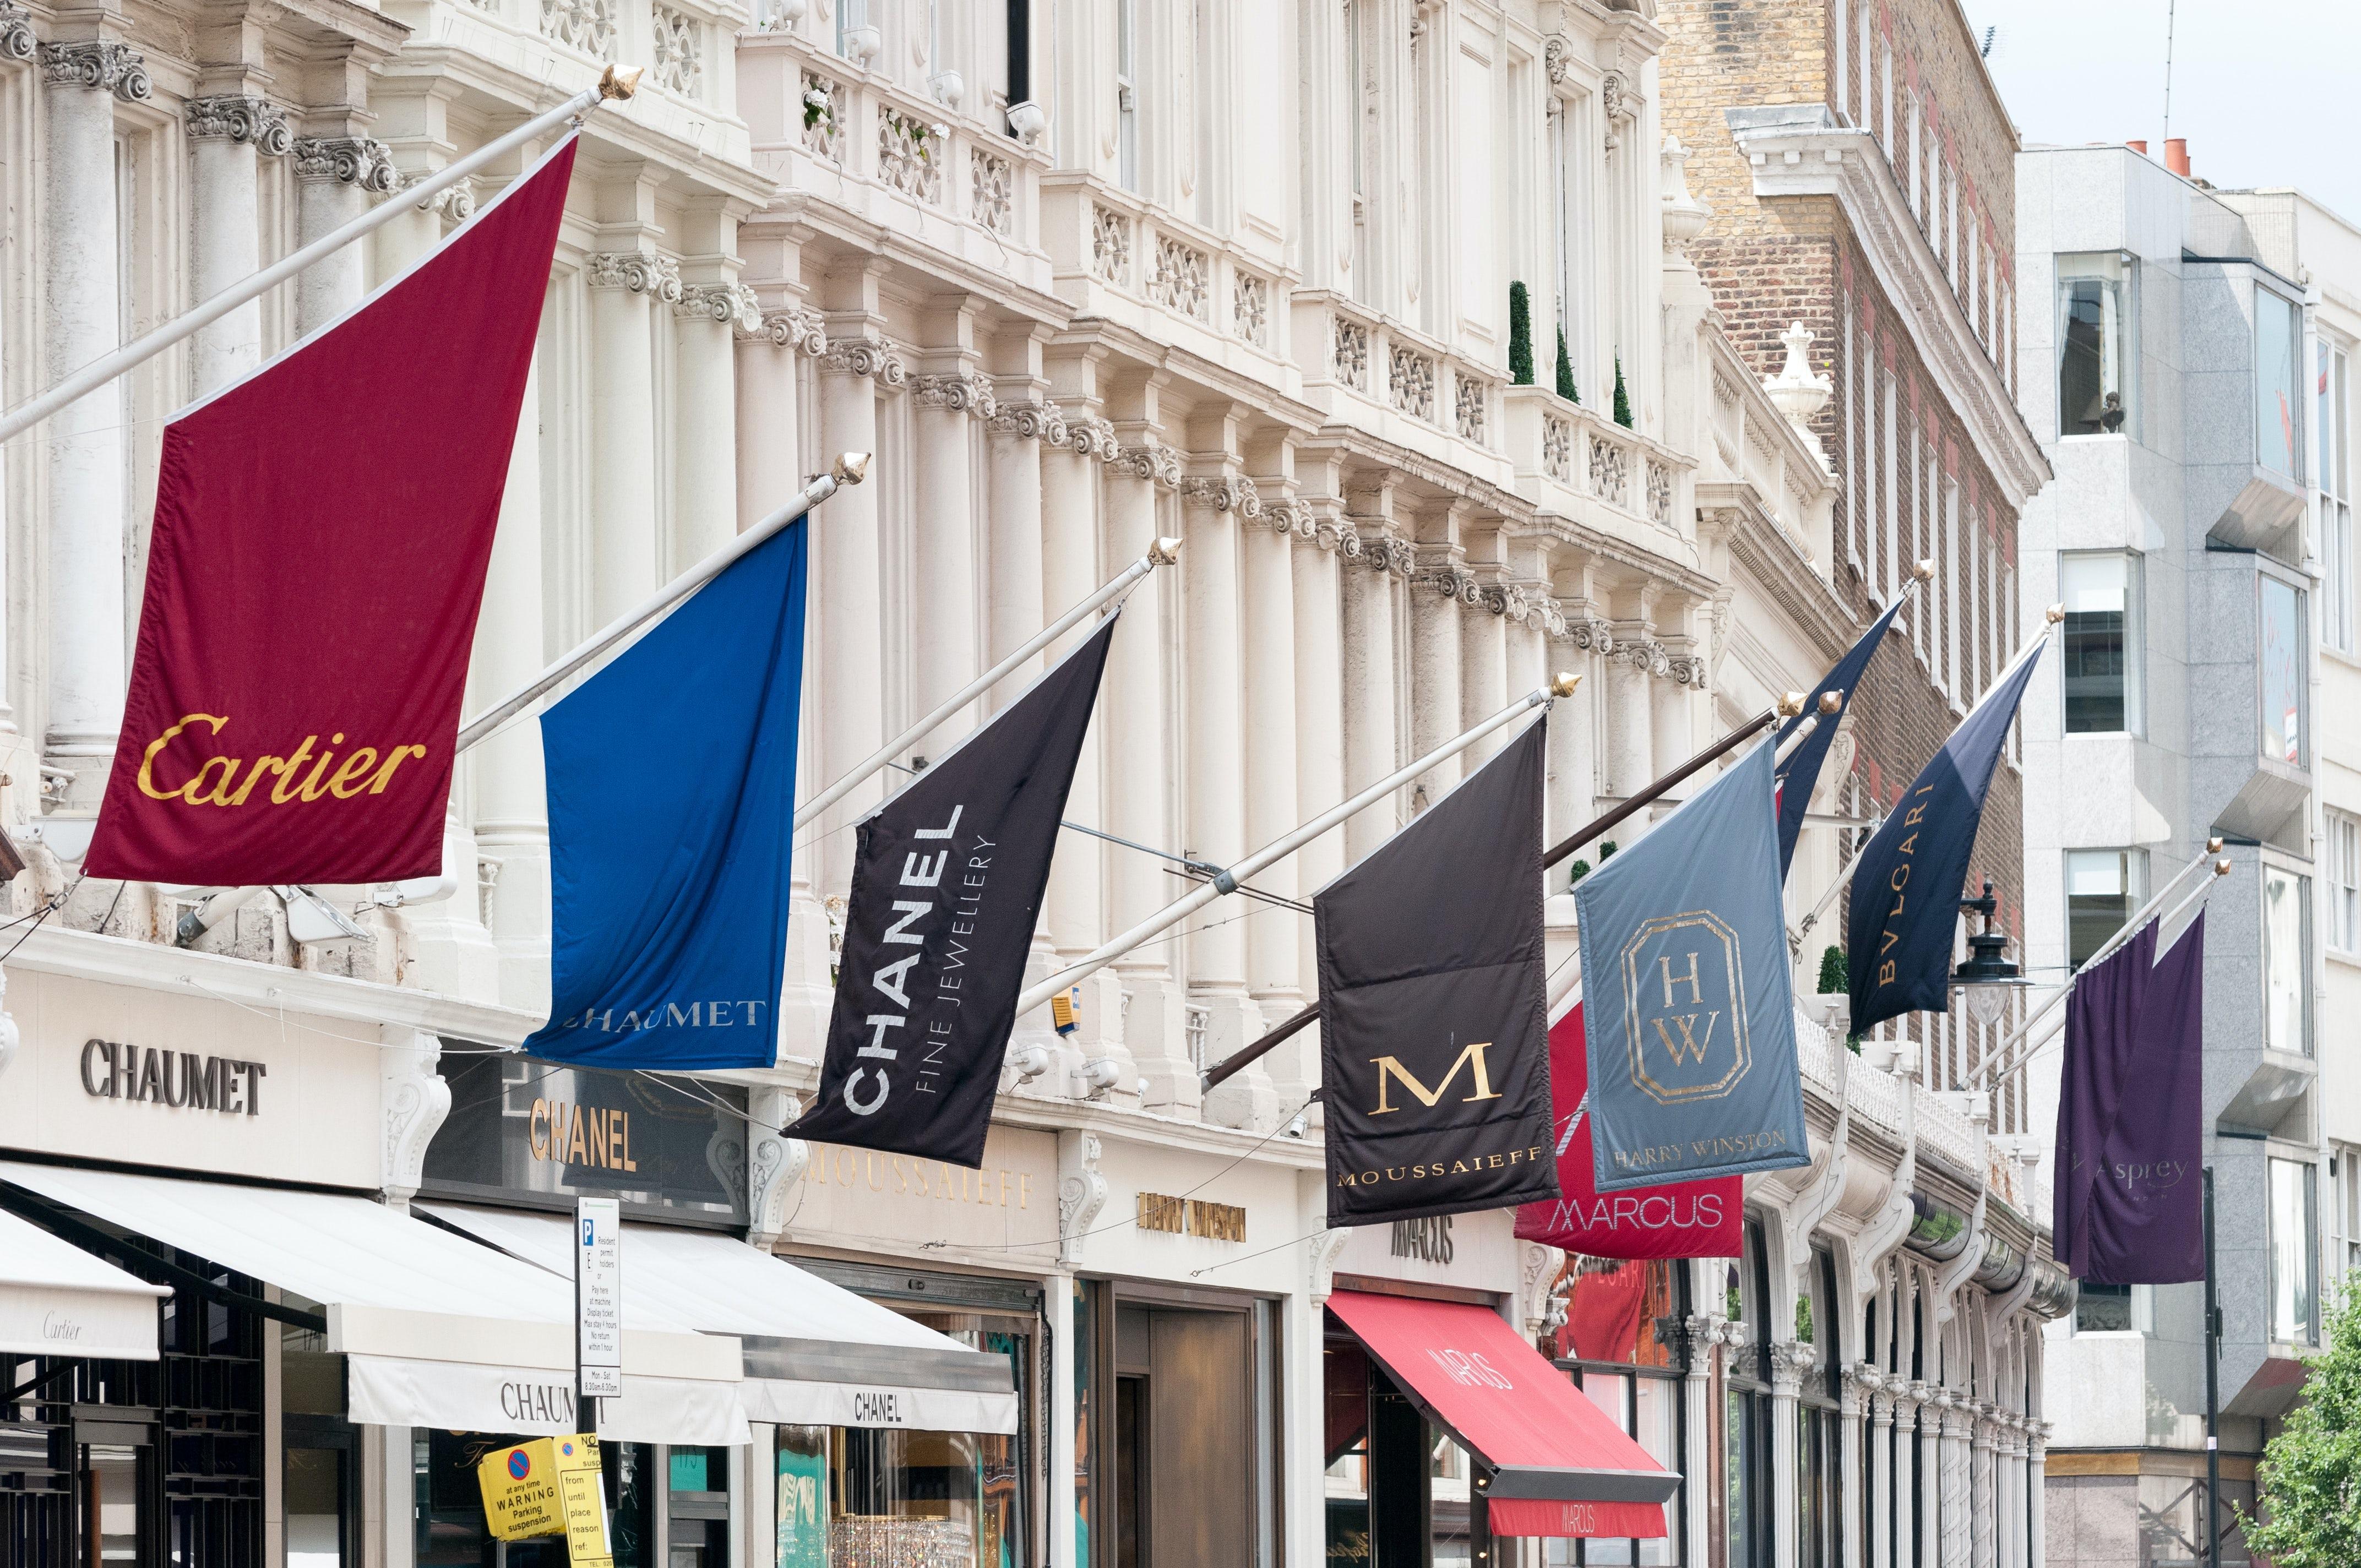 Luxury stores on Bond Street, London | Source: Shutterstock